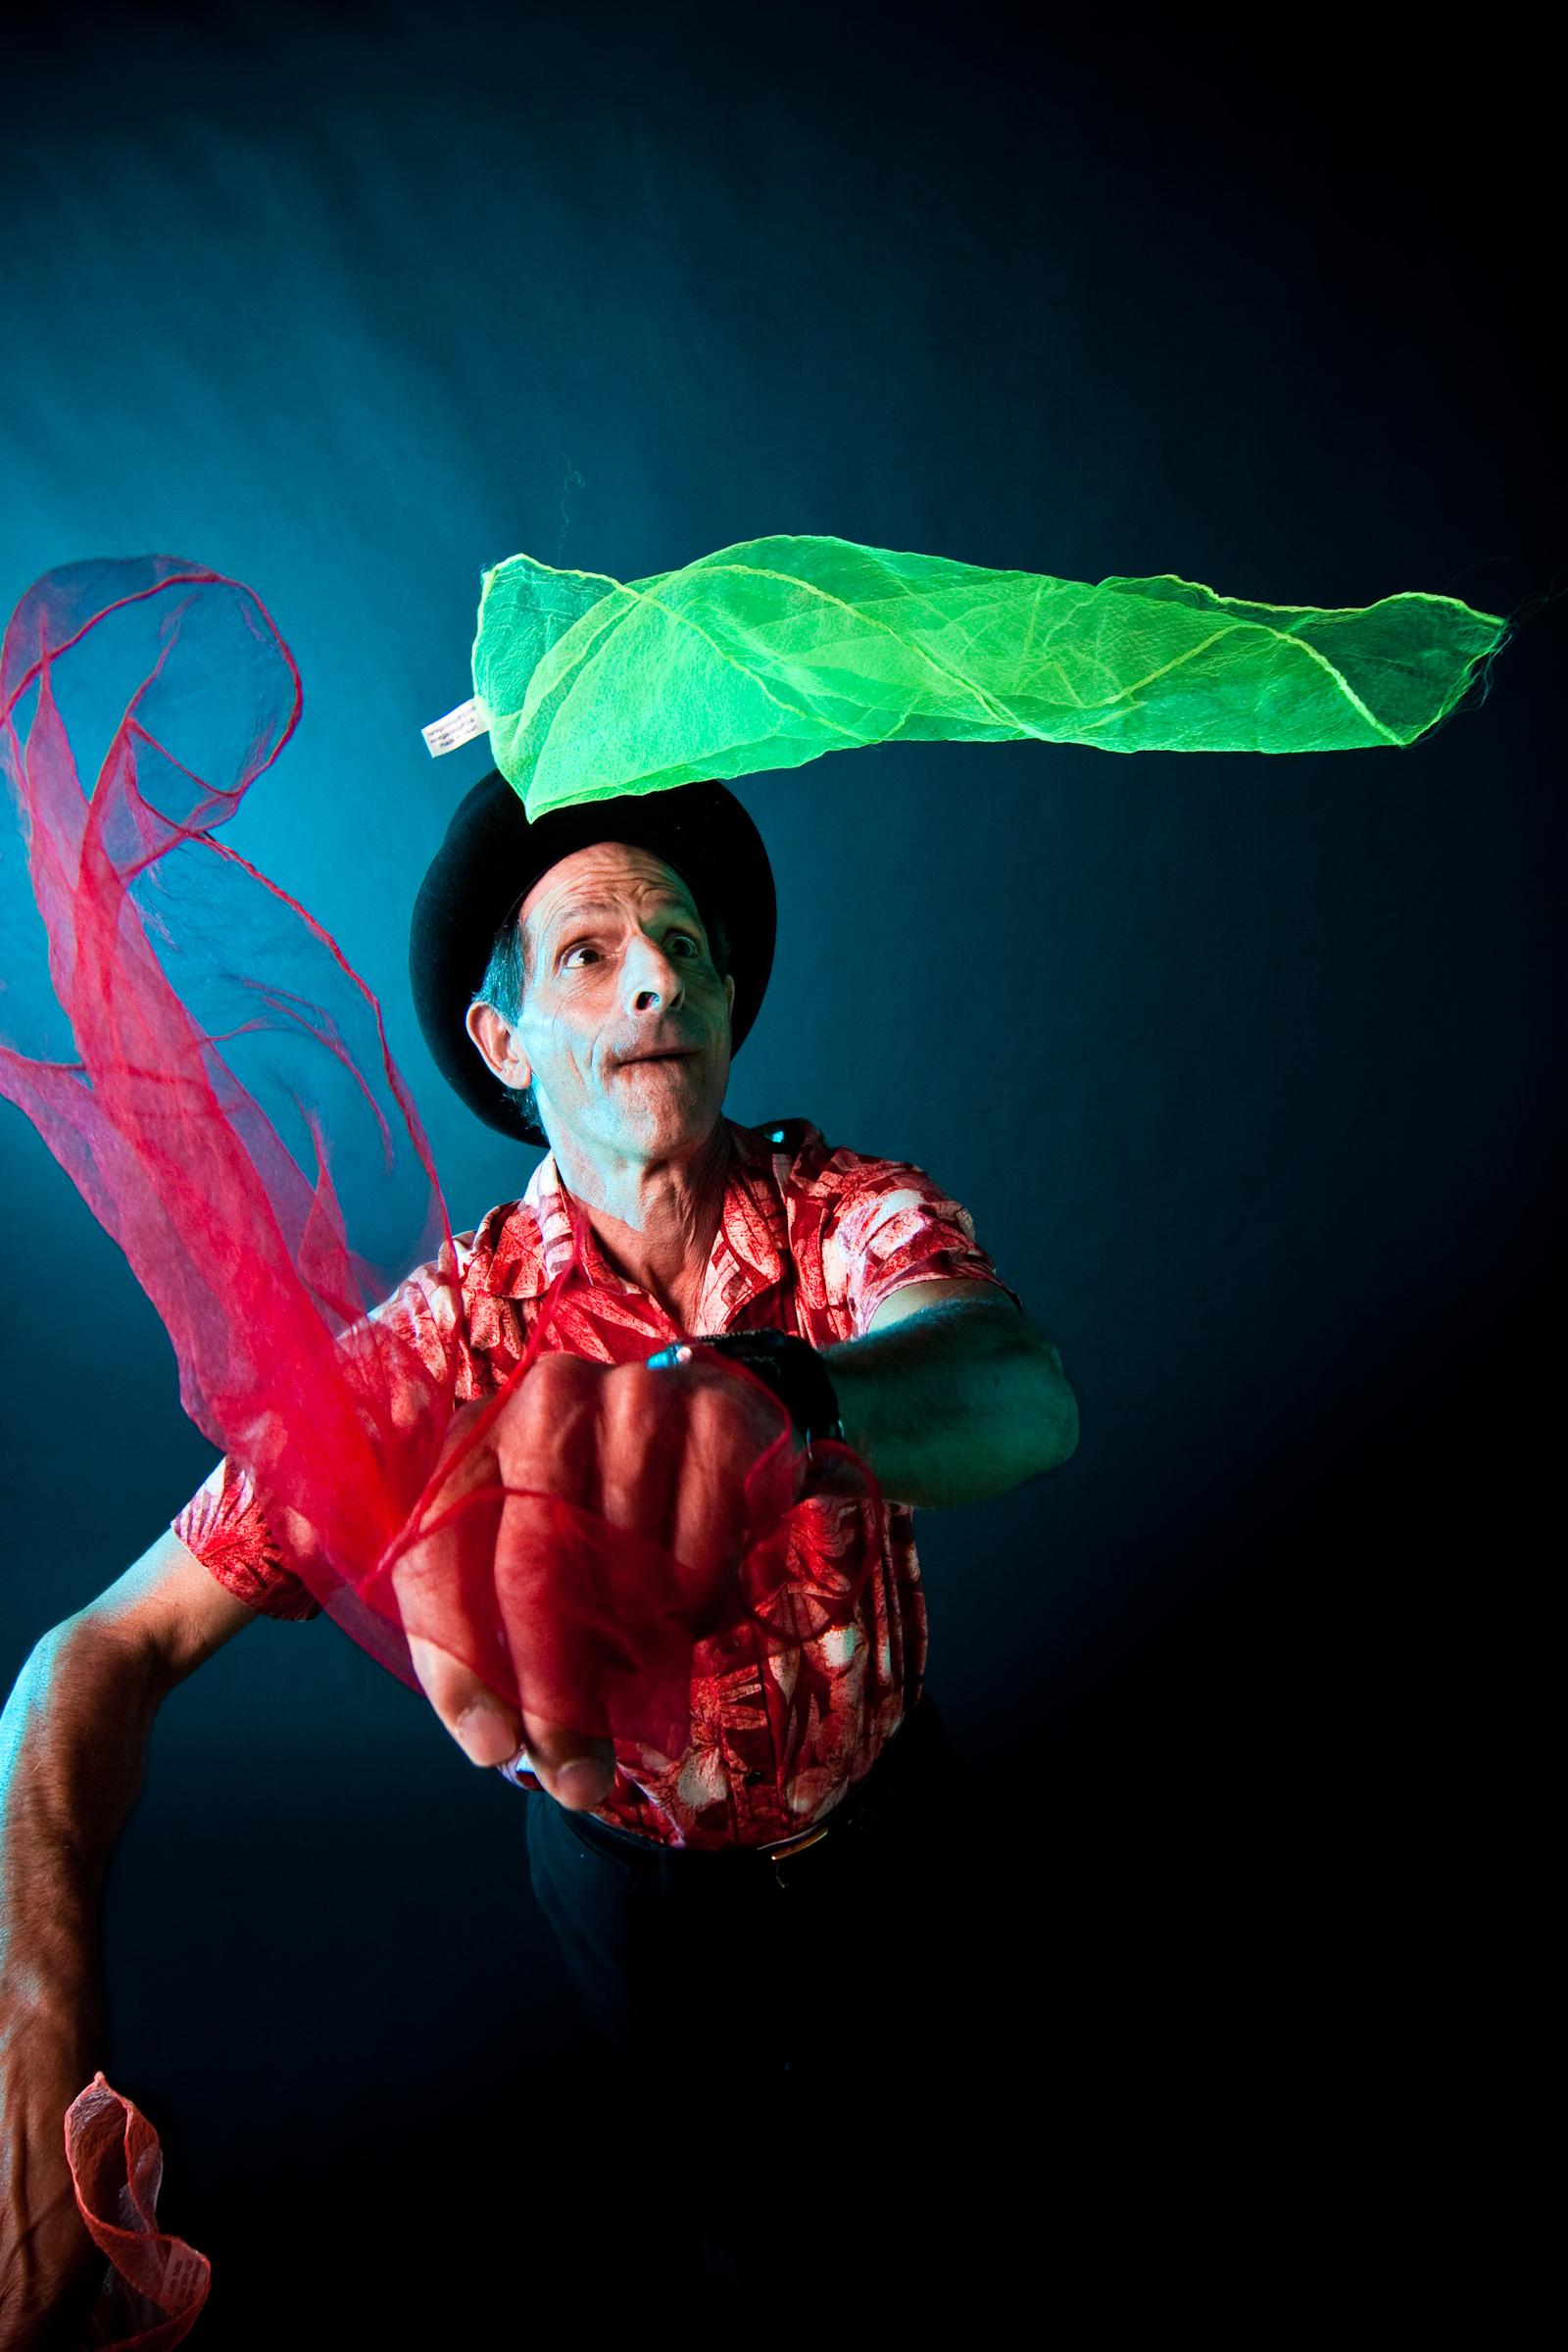 Bob Kahn, Magician, performing his MaGic Energy tricks.